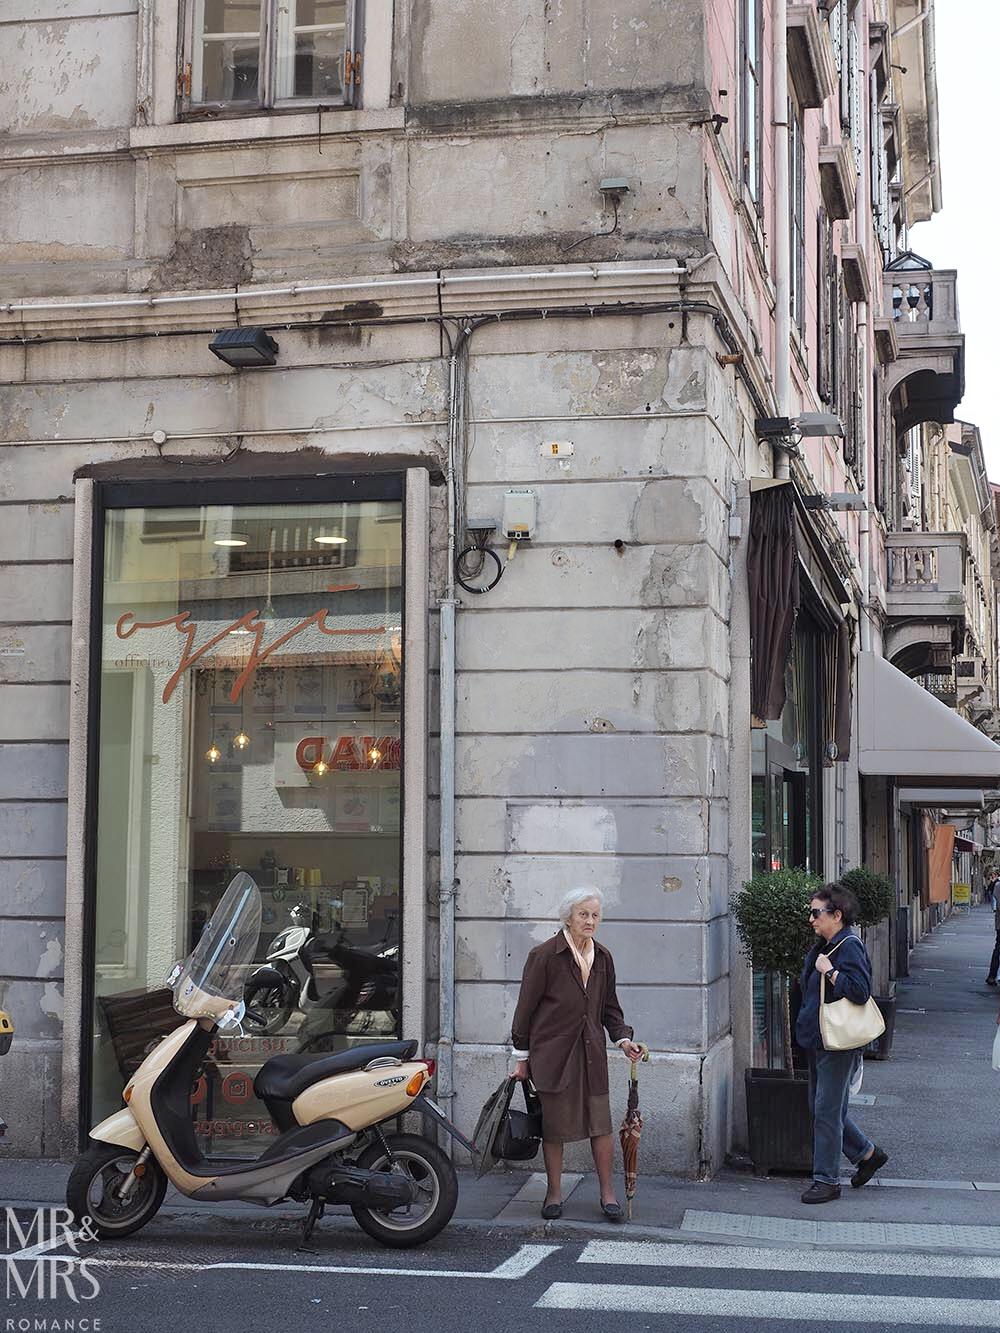 Trieste guide - Triestinas